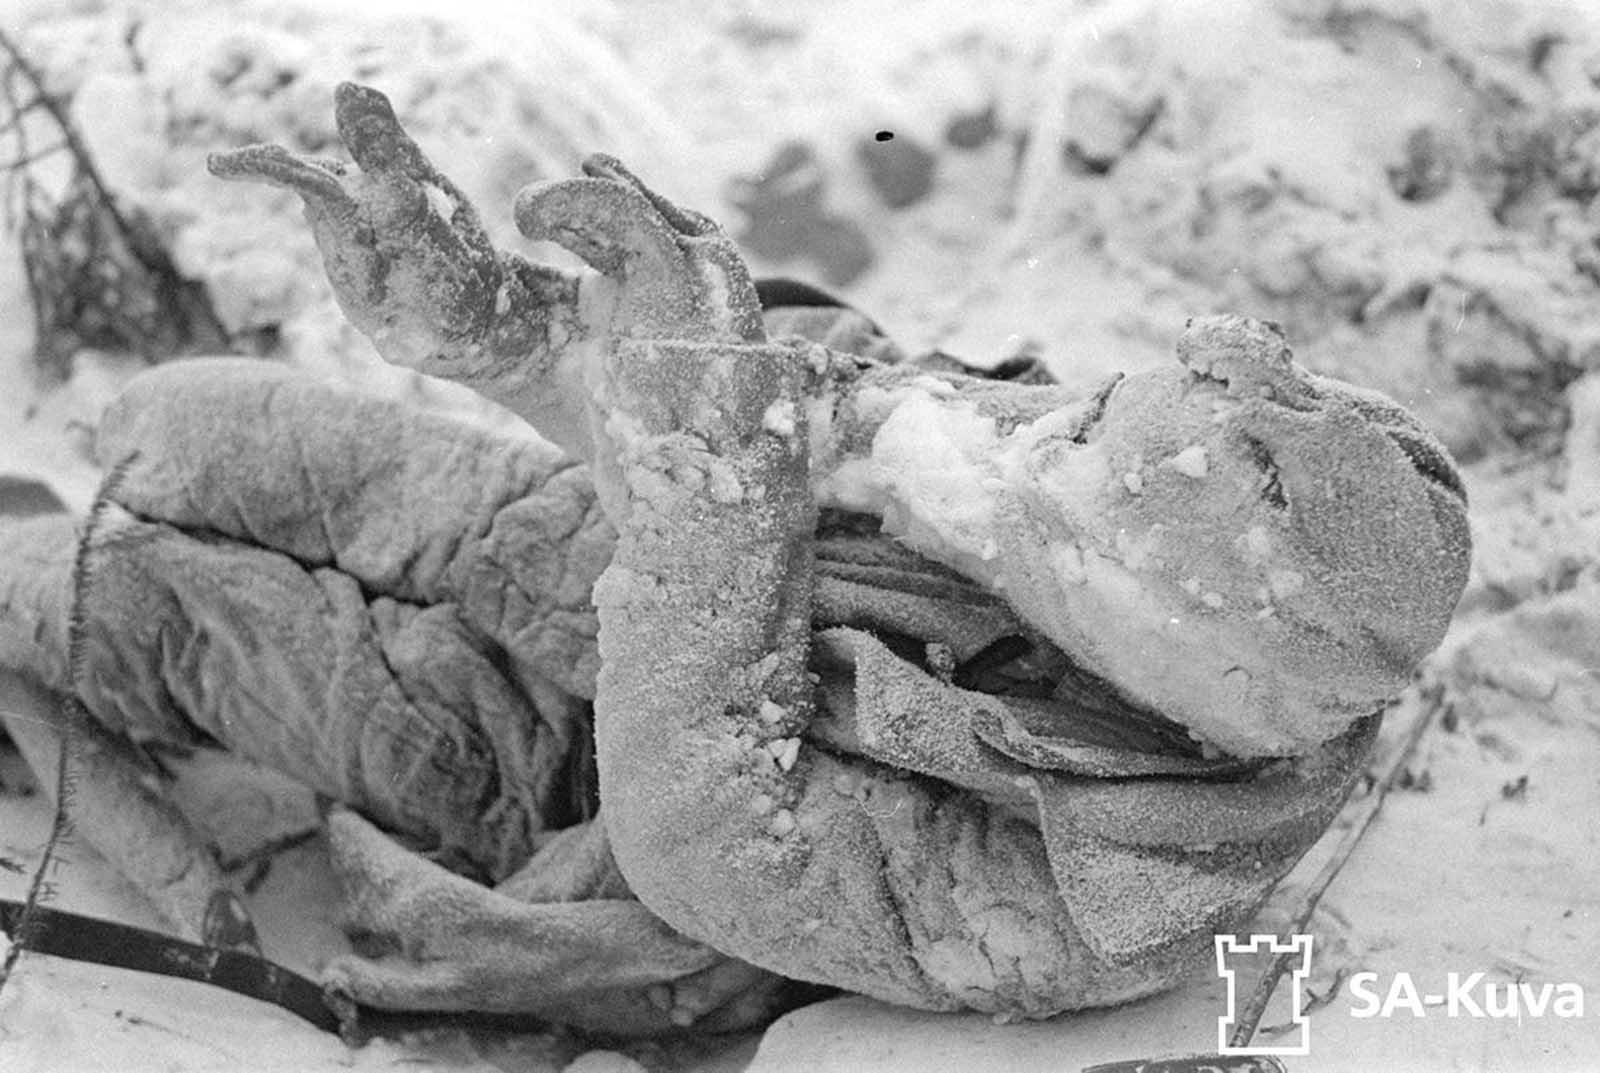 A dead soldier, his body frozen.